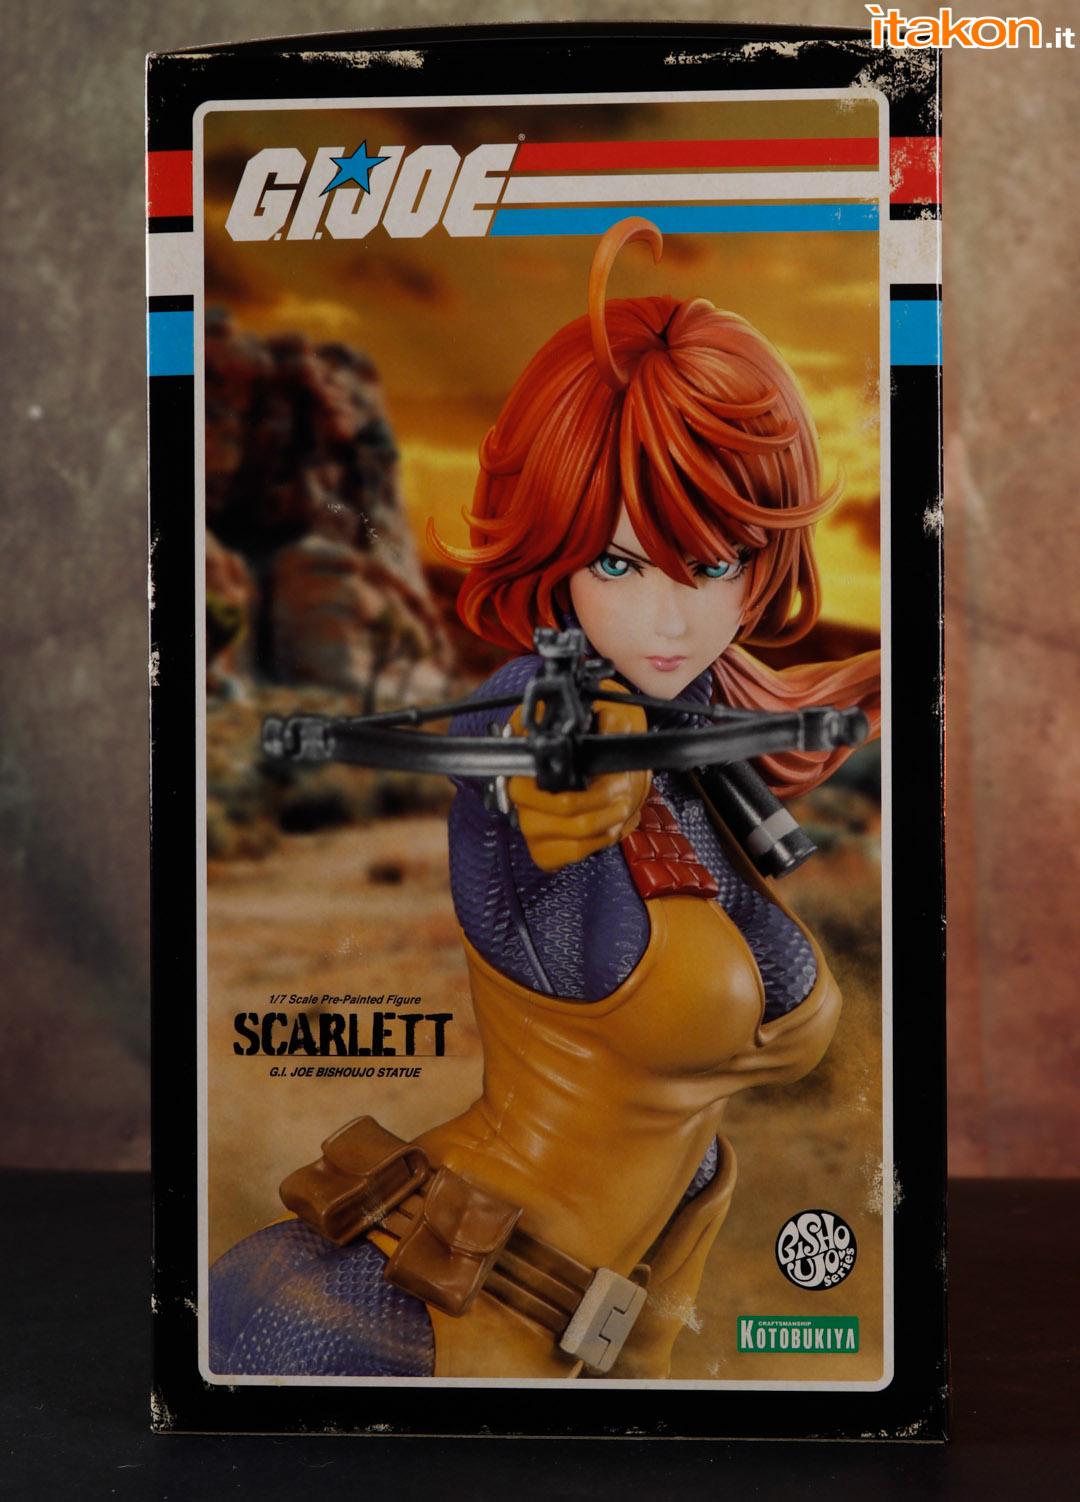 Link a Scarlett Bisho Koto002